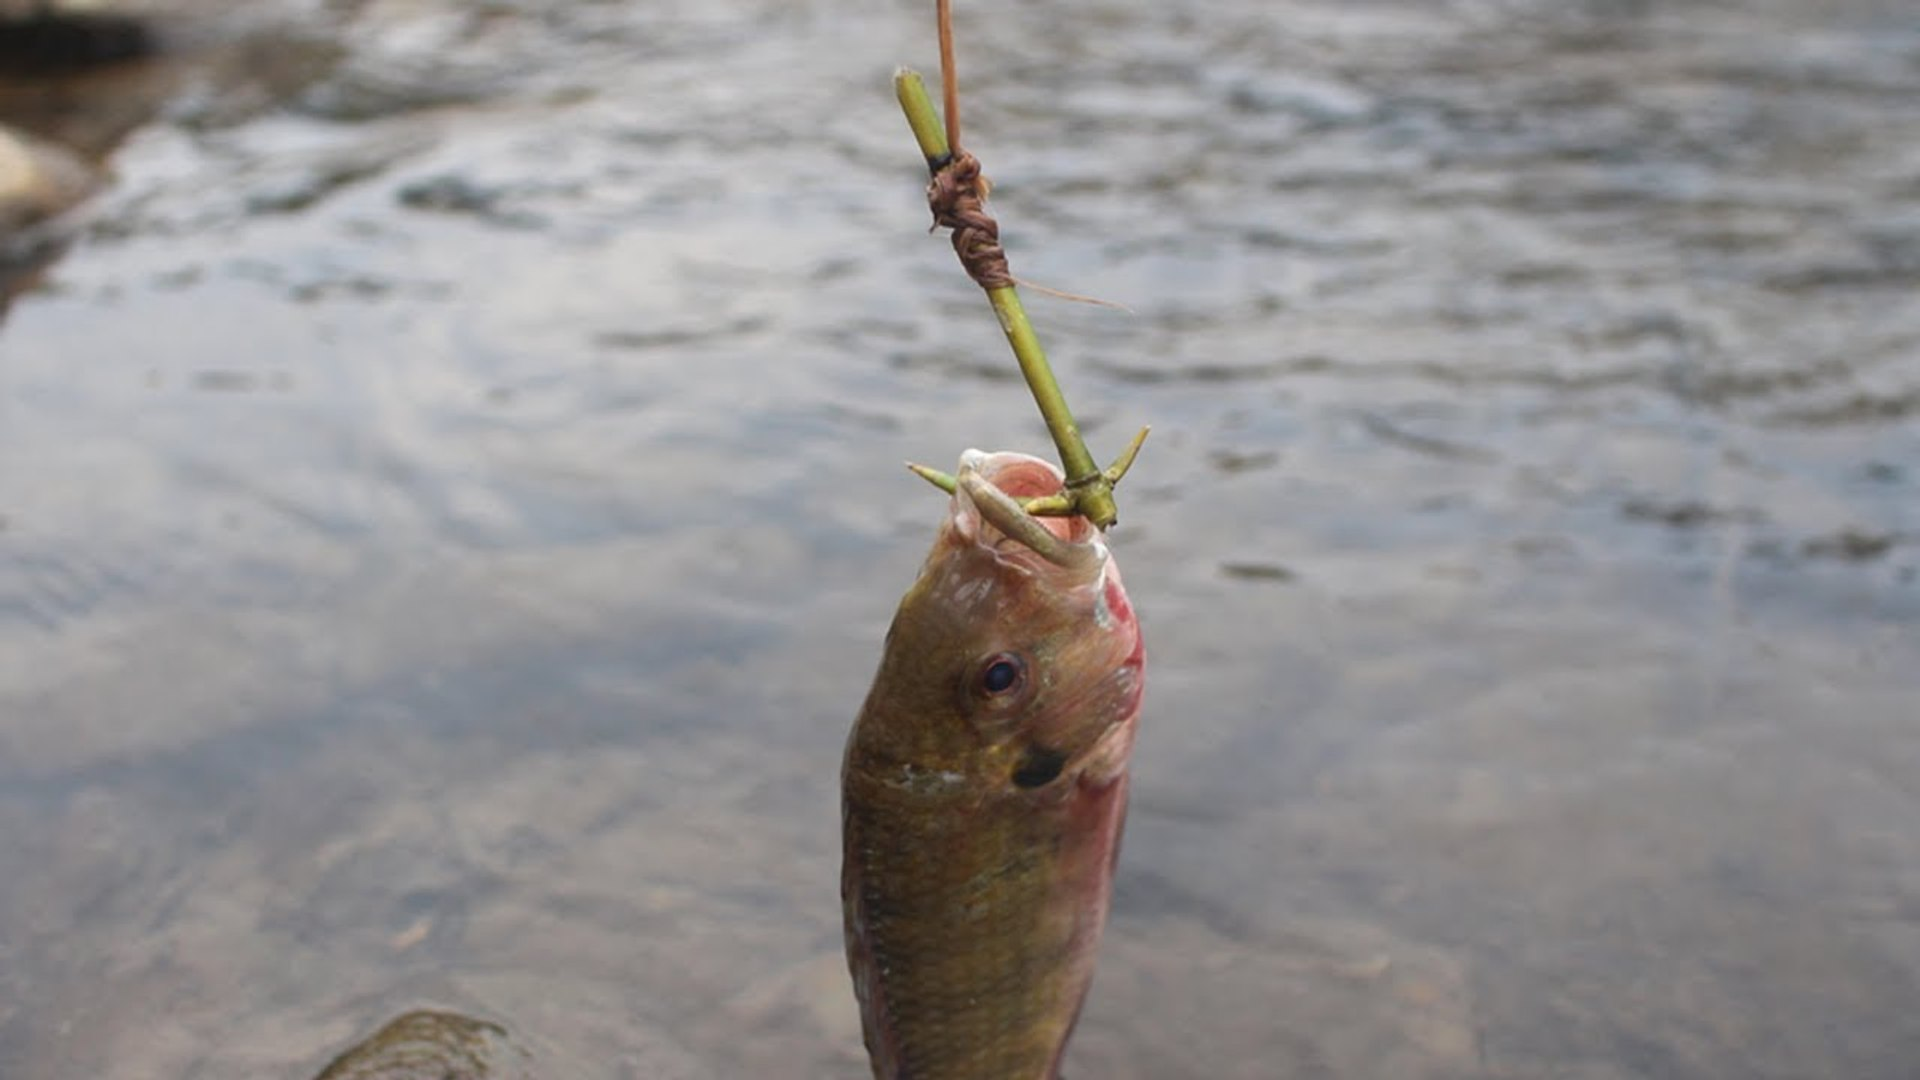 Primitive Technology: Simple fish traps with primitive technology.